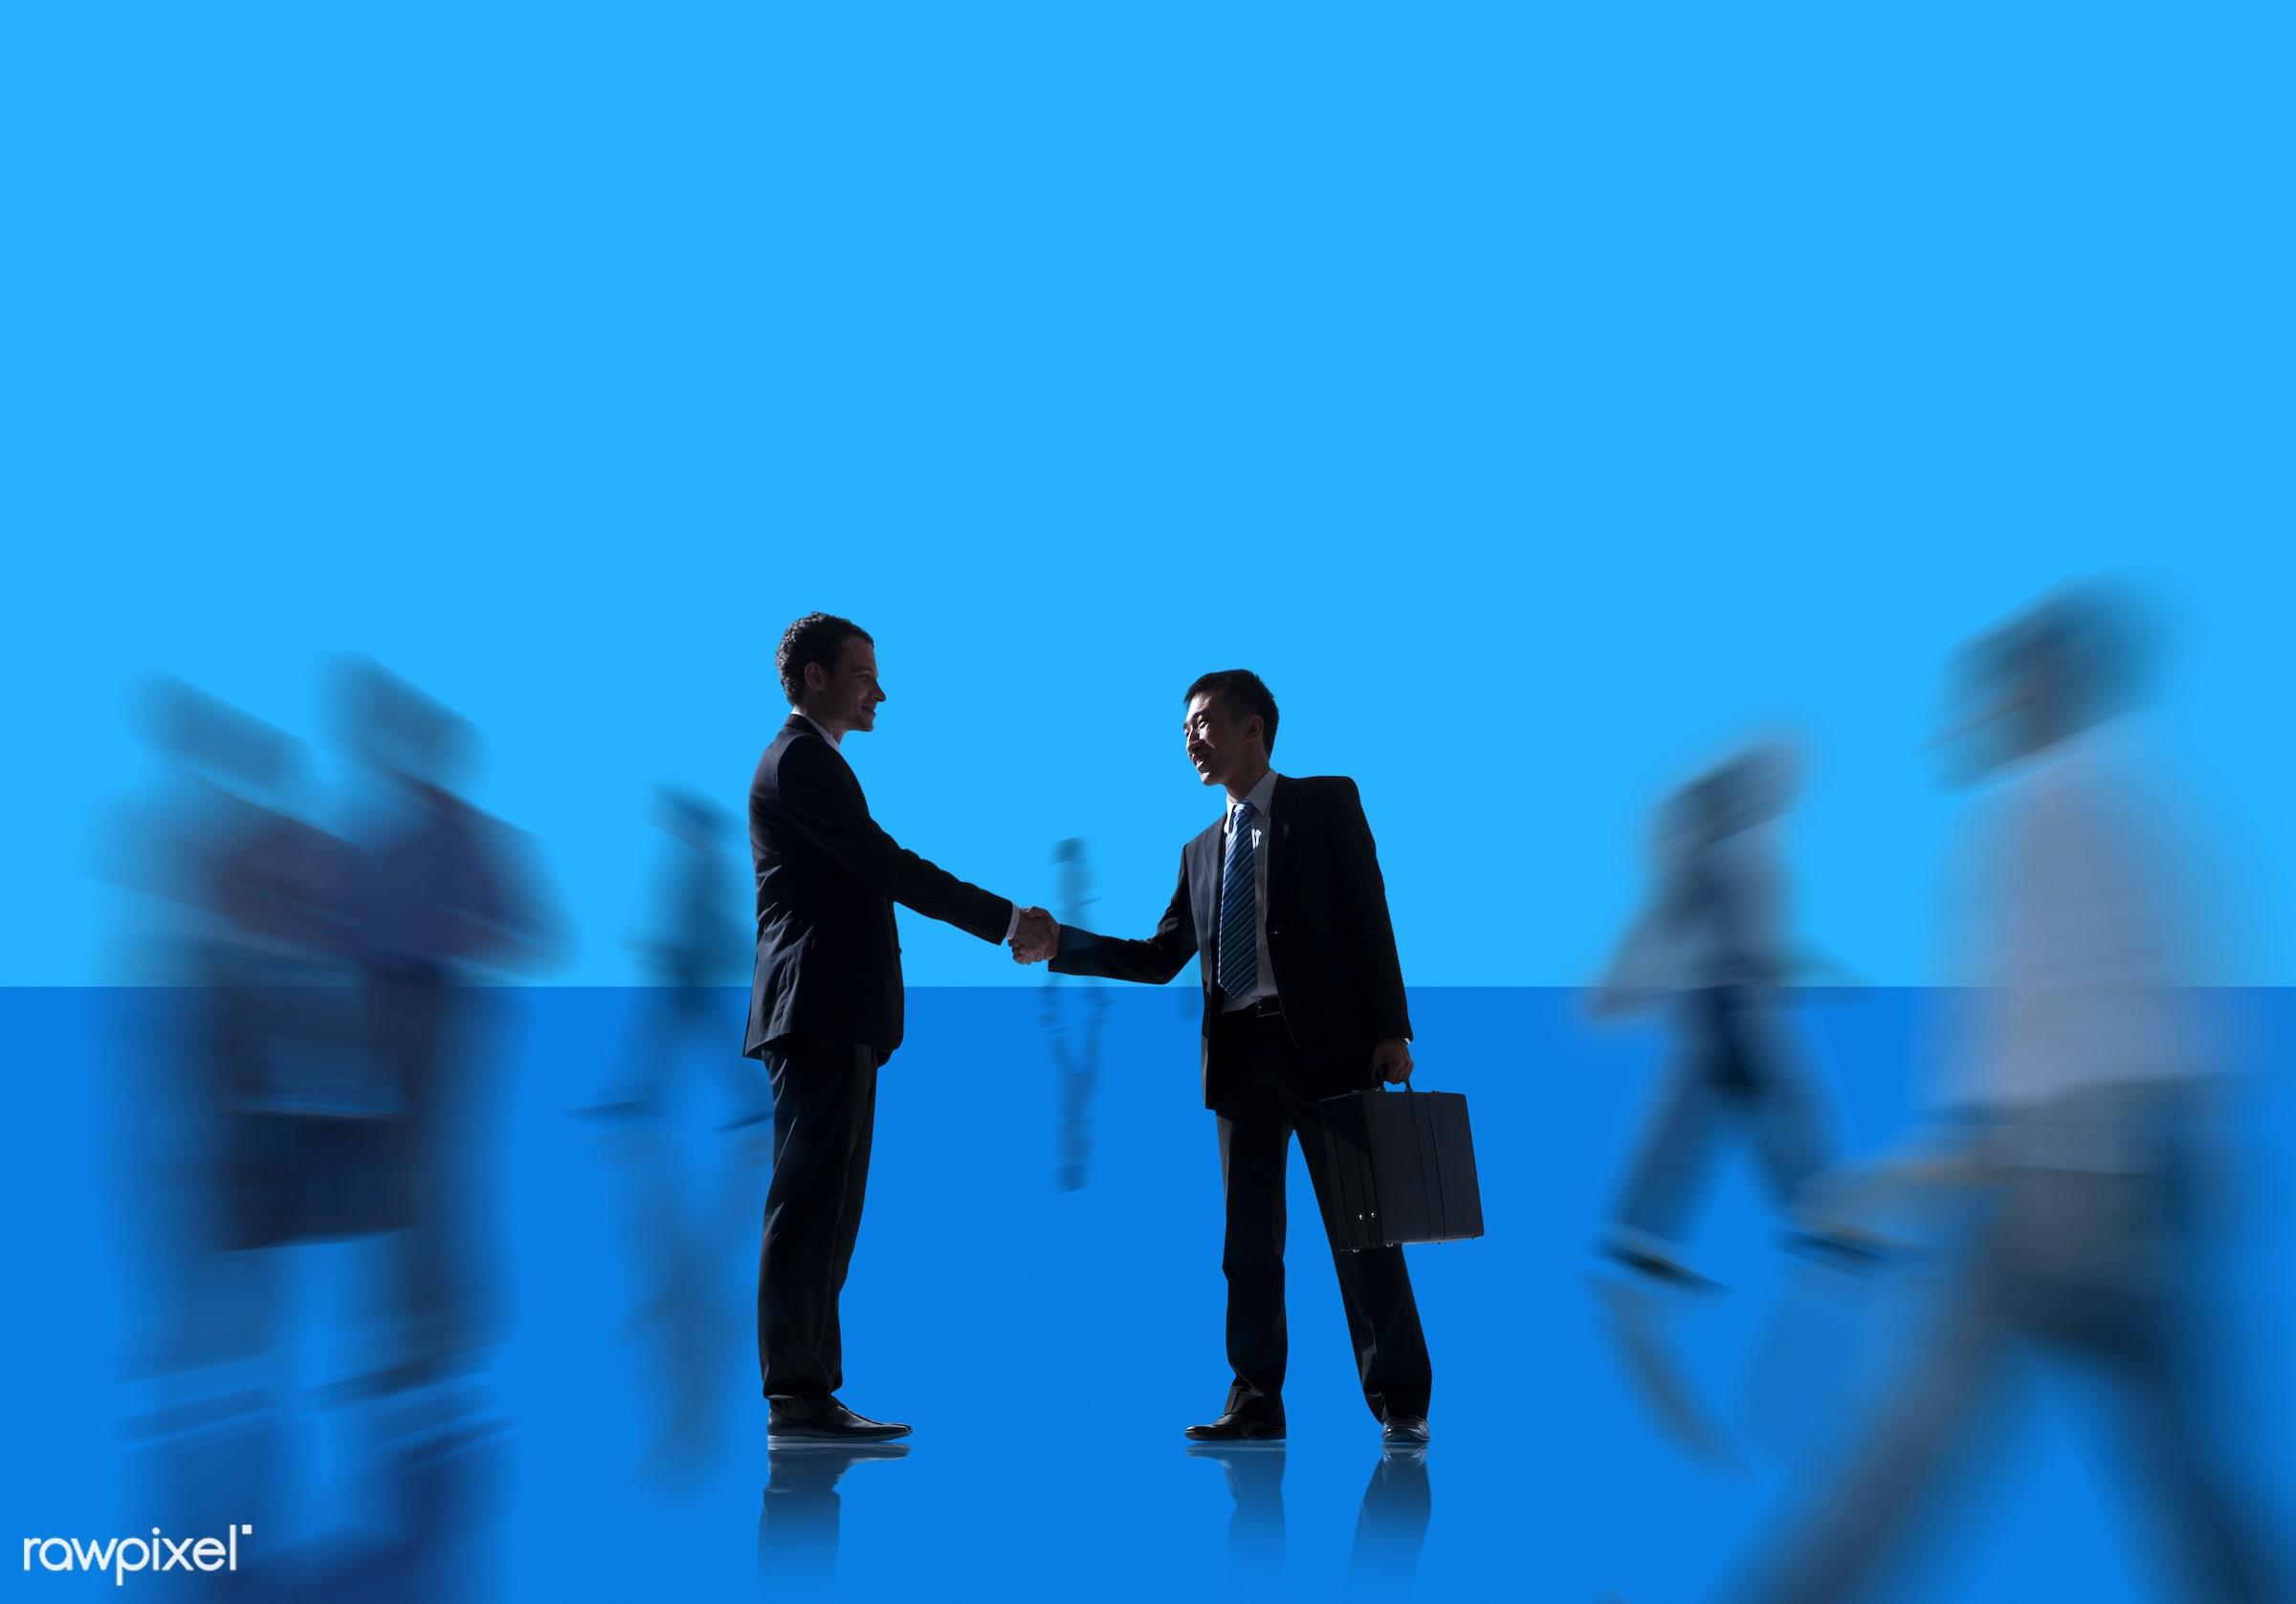 agreement, blank, blue, business, business people, businessmen, businesswomen, collaboration, colleague, communication,...